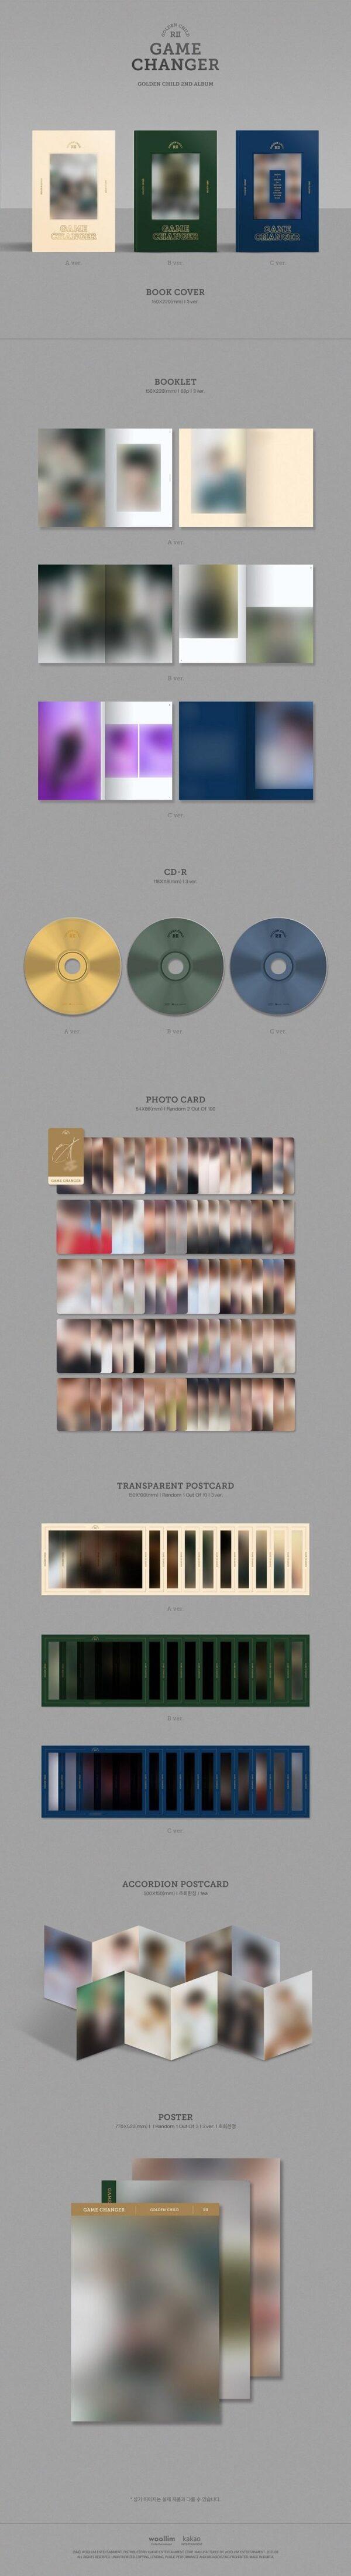 2nd Album de Golden Child Game Changer Standard Edition A Ver B Ver C Ver. 1